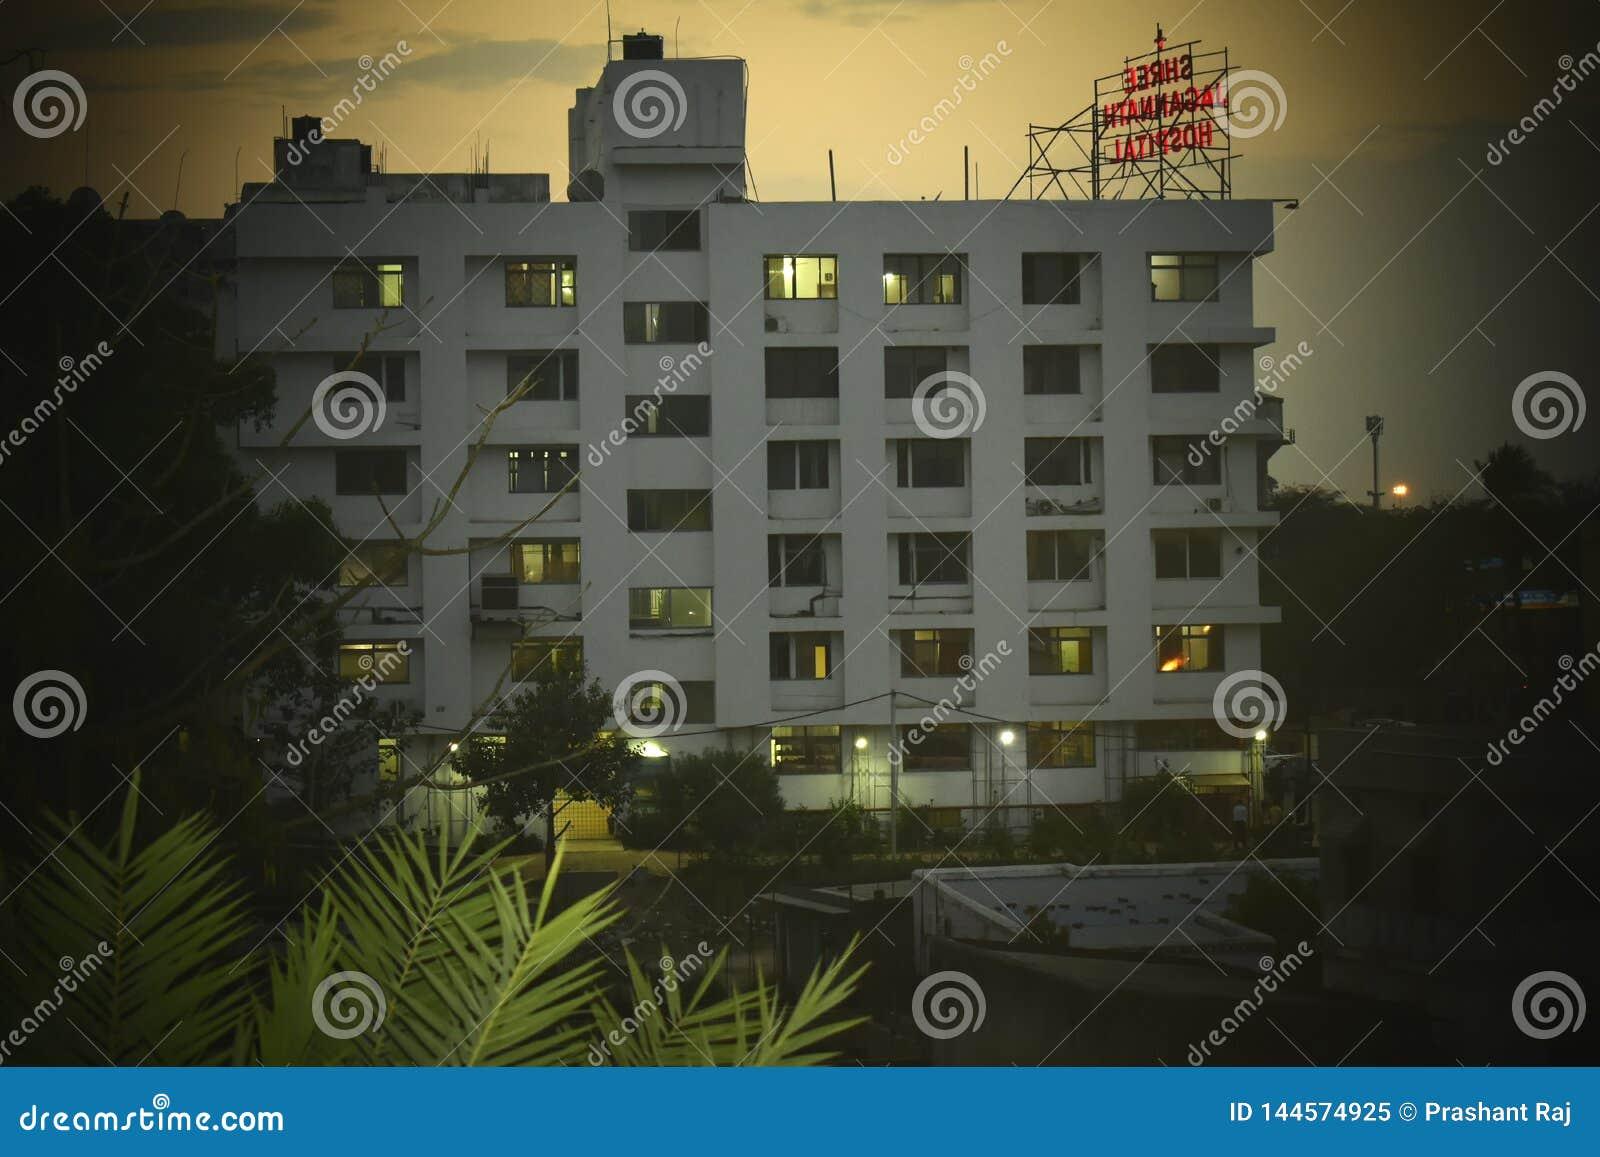 Shree jagarnnathsjukhus